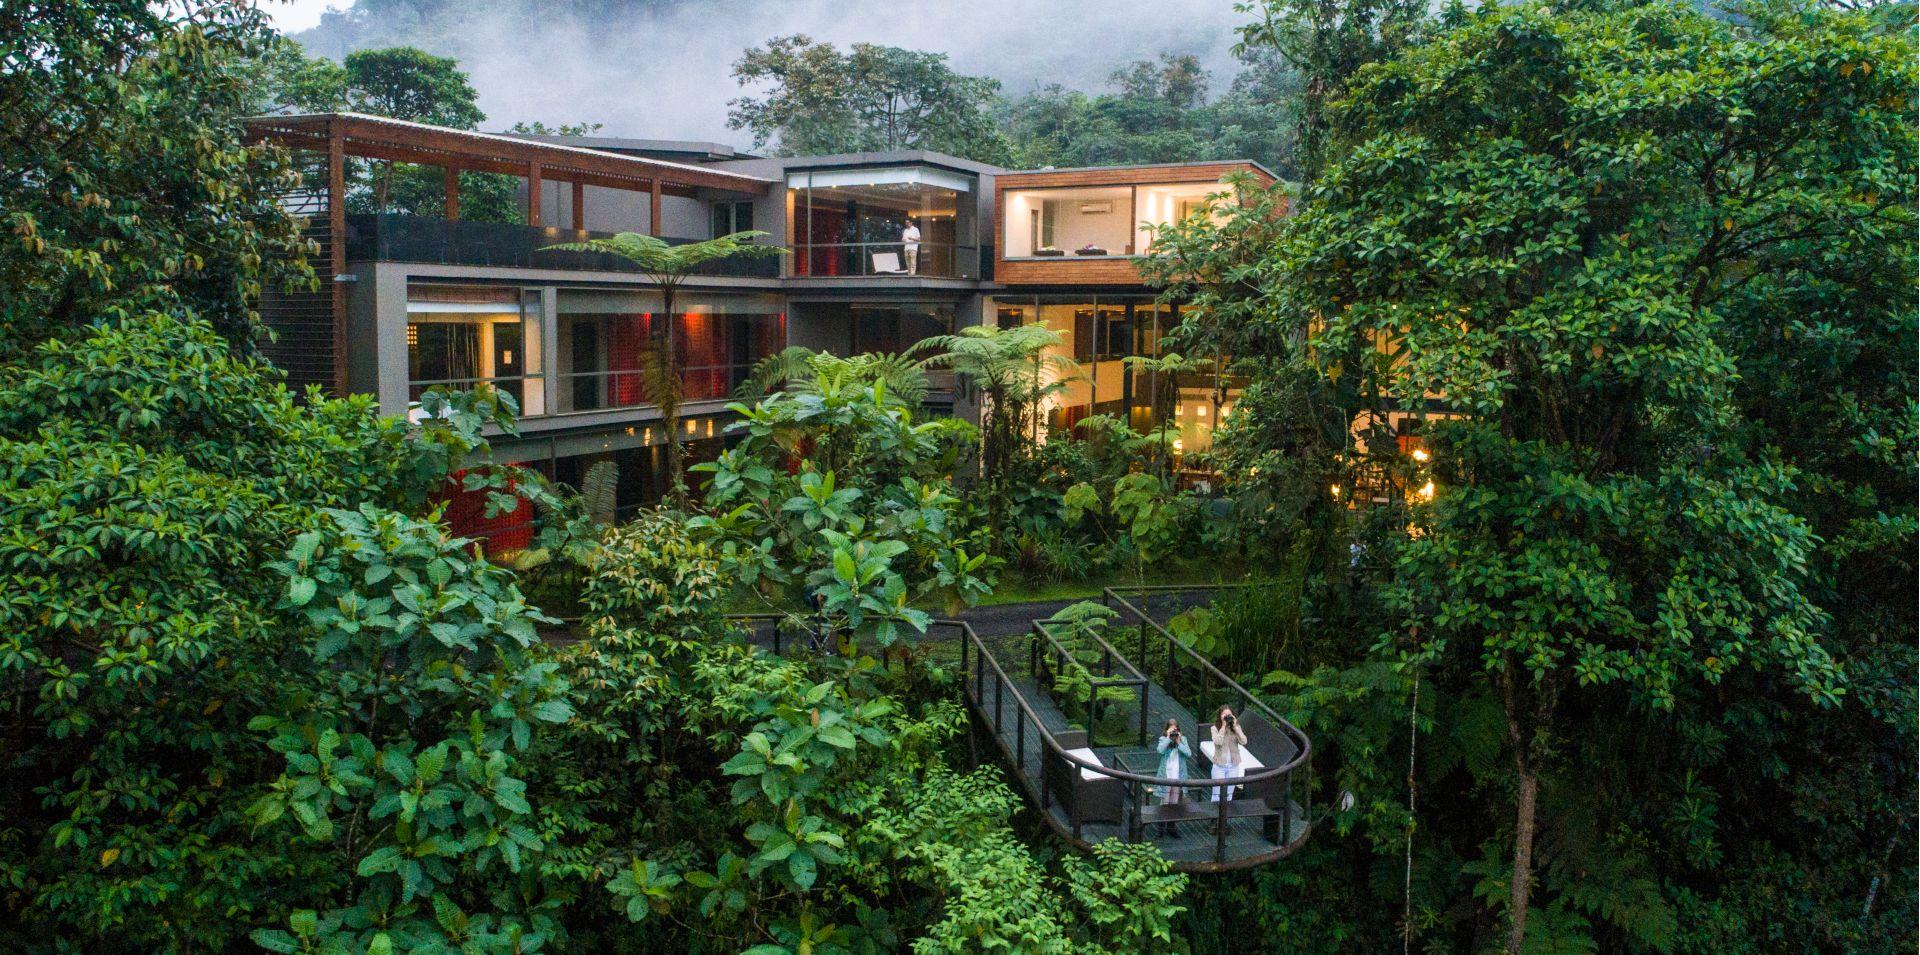 Mashpi Lodge beautifully adapted to the rainforest